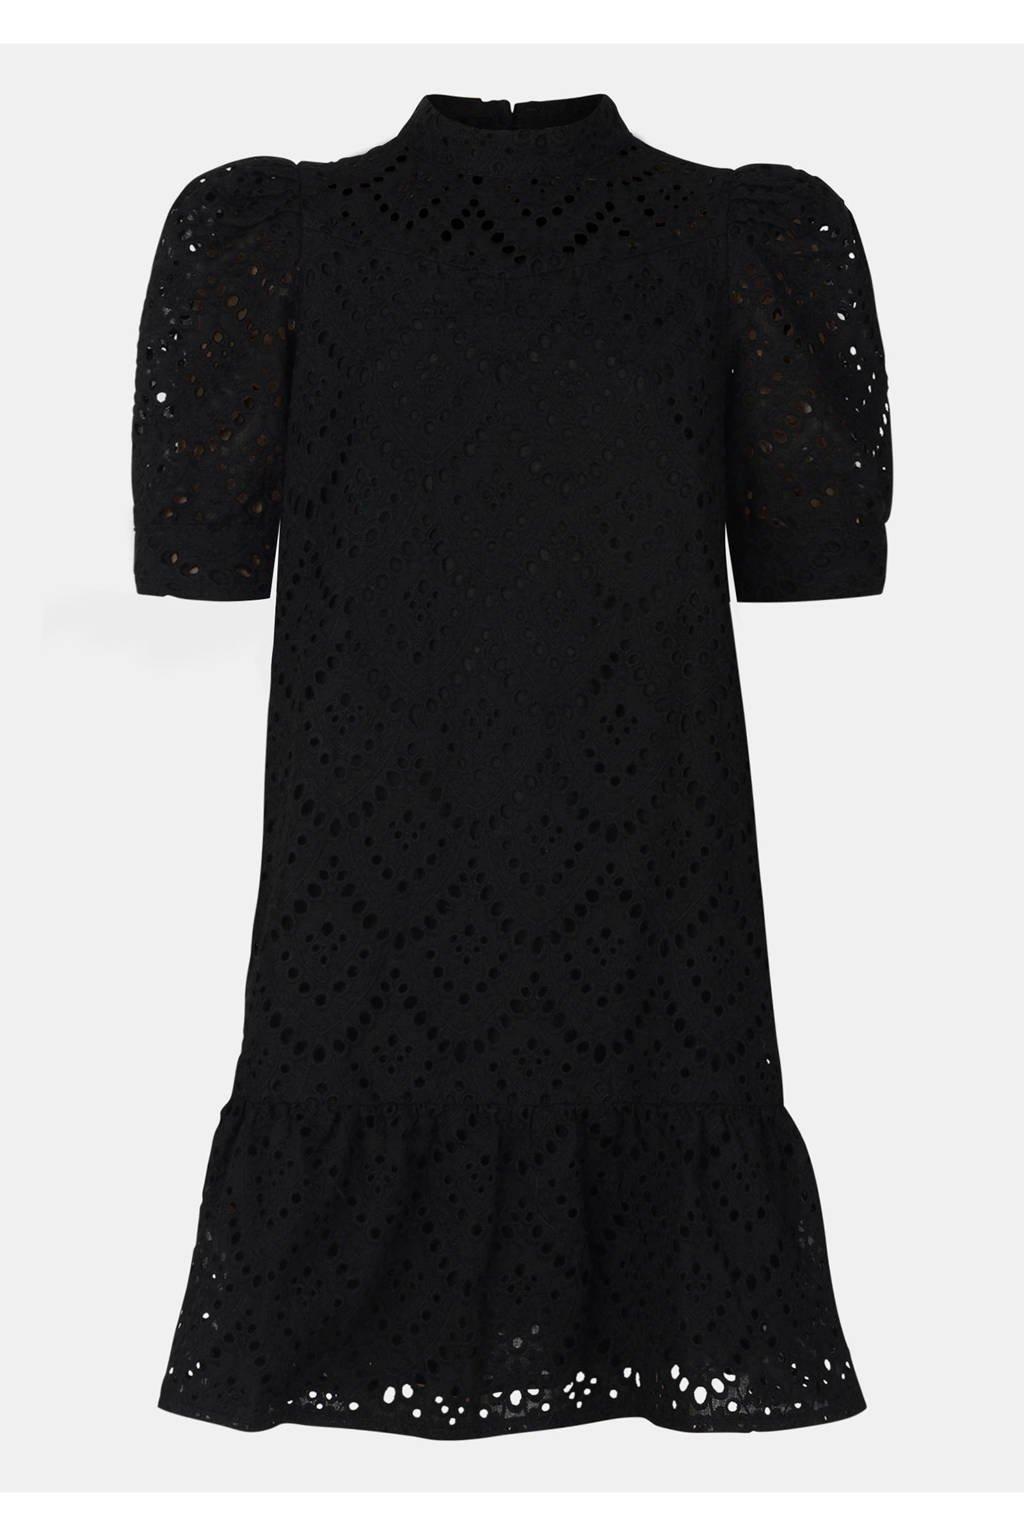 Jill & Mitch by Shoeby jurk Rainbow met volant zwart, Zwart